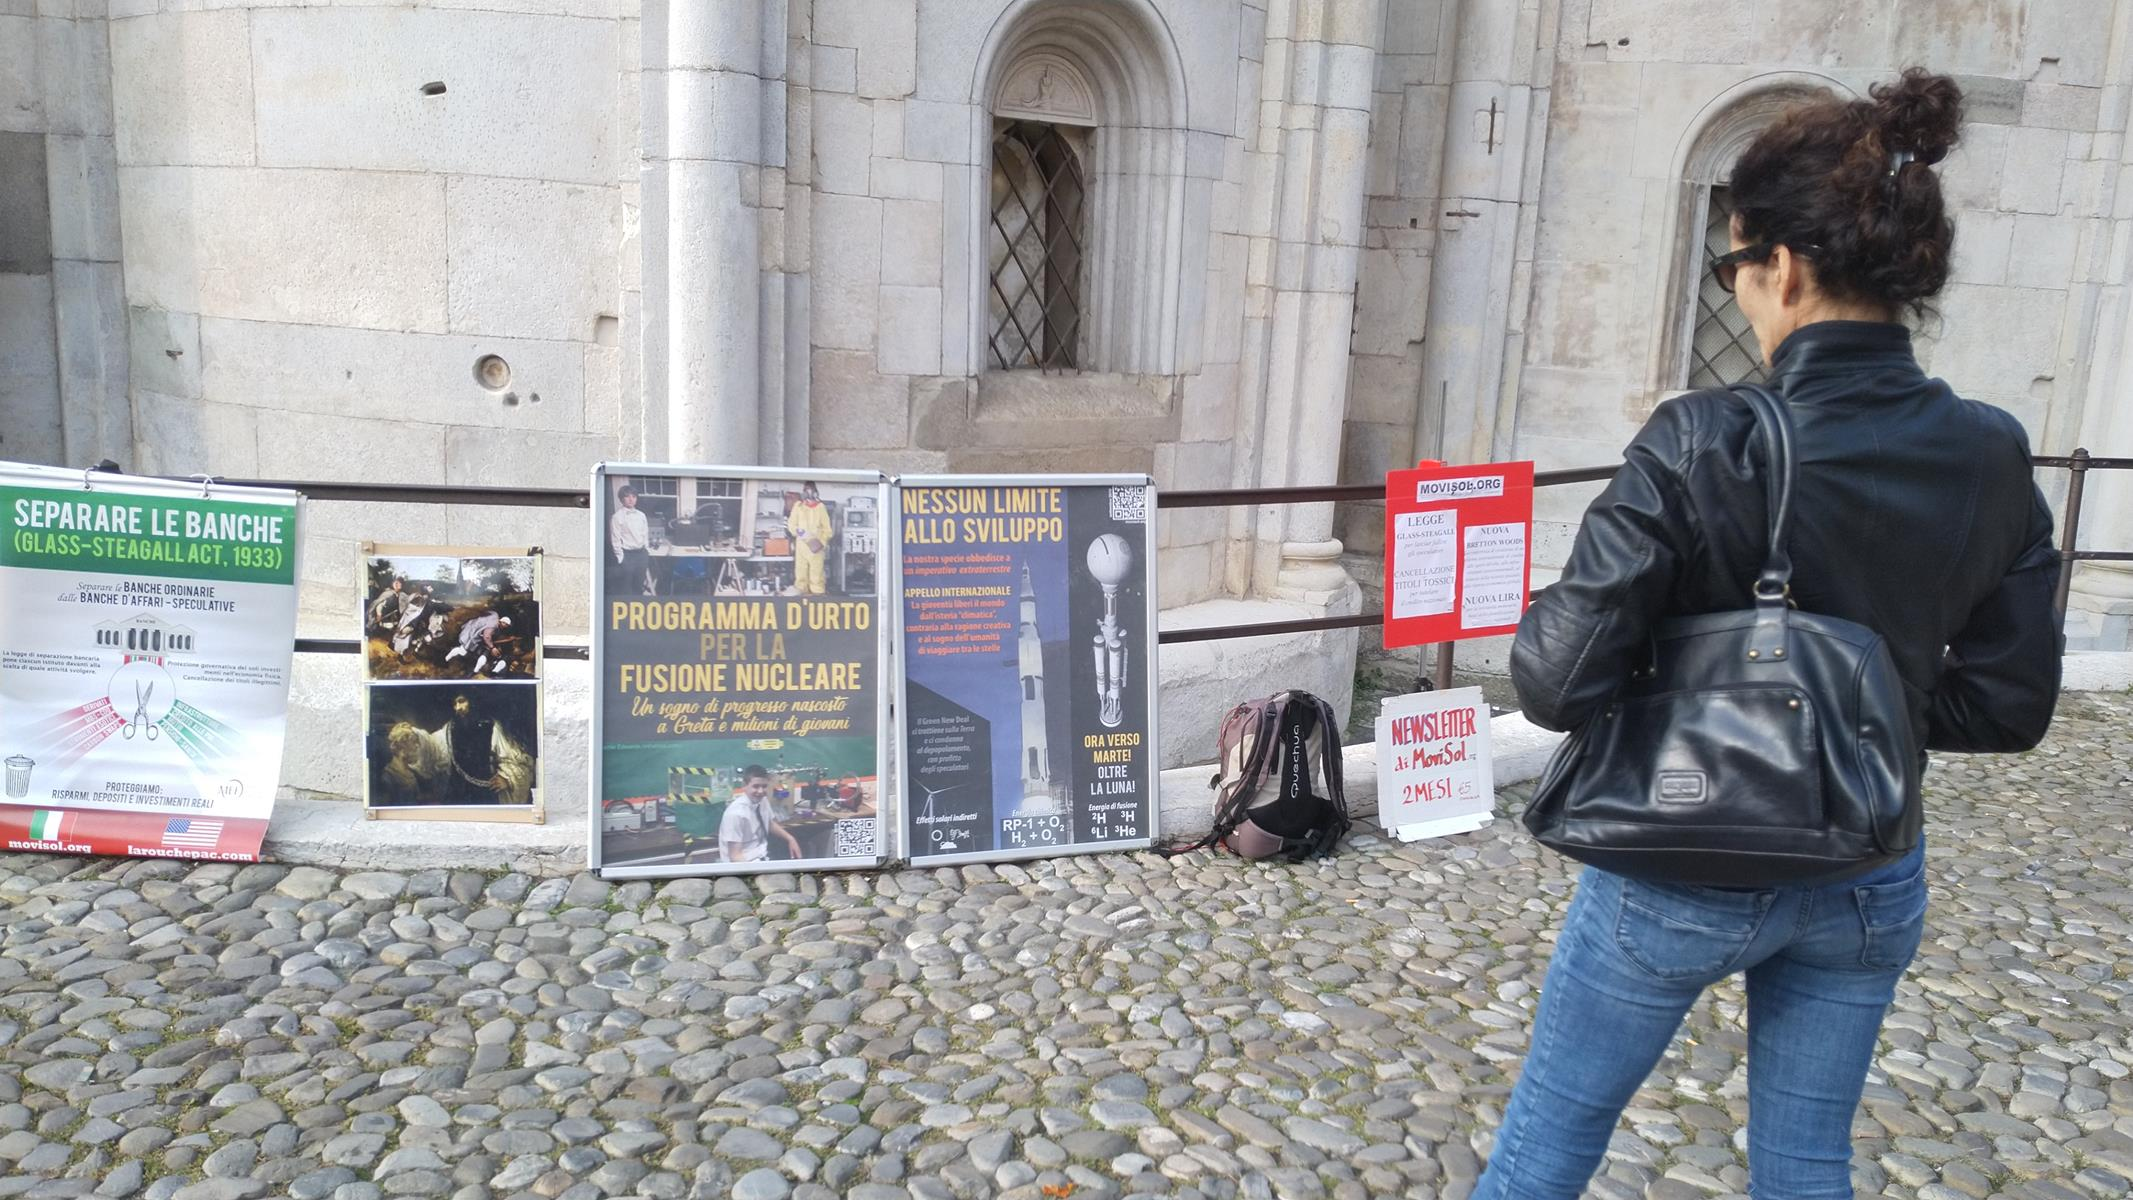 Manifestazione a Modena per lo